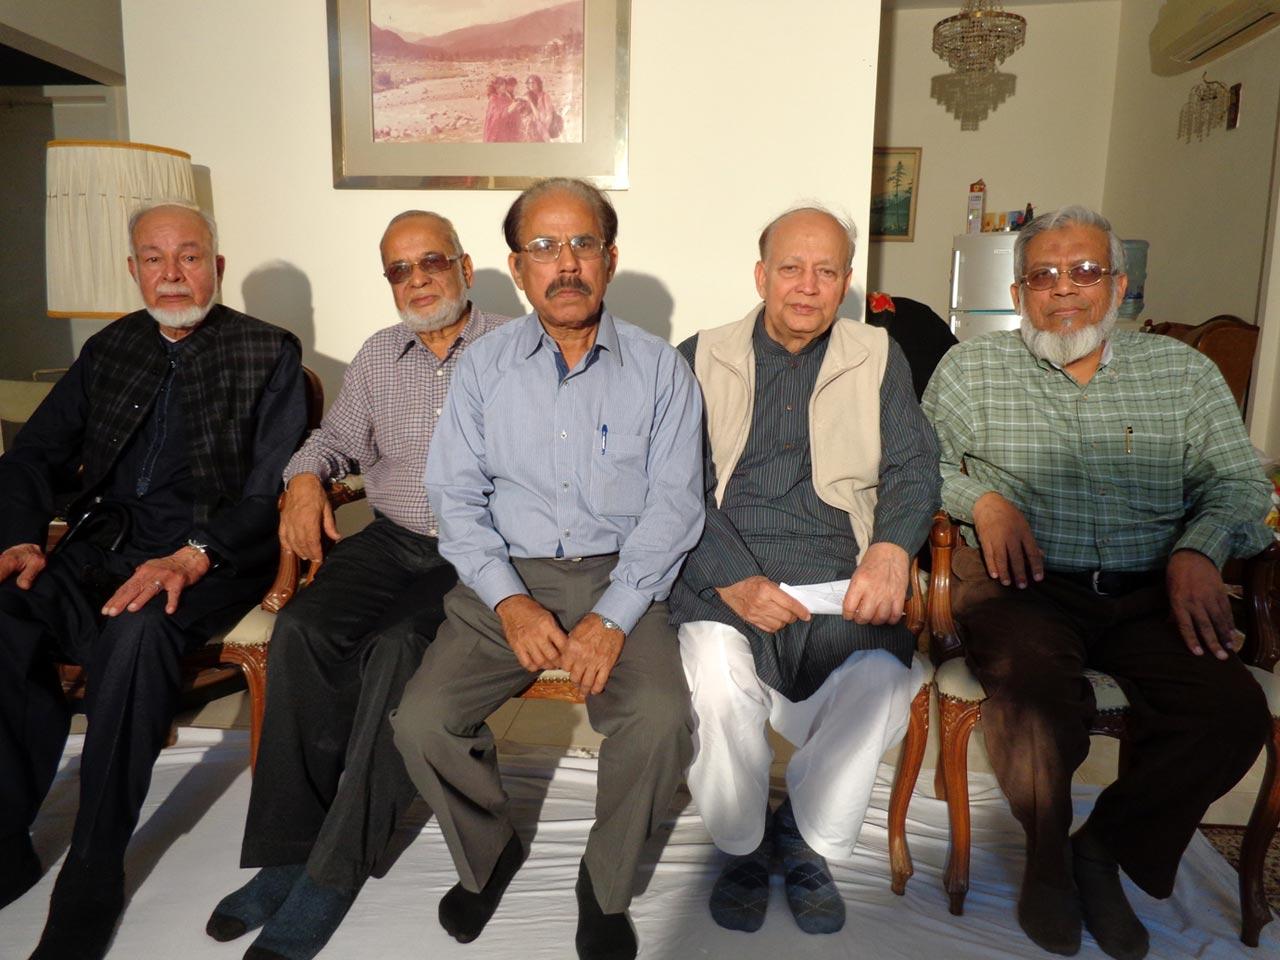 S. Mehmood Ali, Mohammad Abdul Mateen, Shafiq A. Khan, Dr. K. Yousufullah Siddiqui, Engr. Iqbal Ahmed Khan ( Ex-Aramcons )